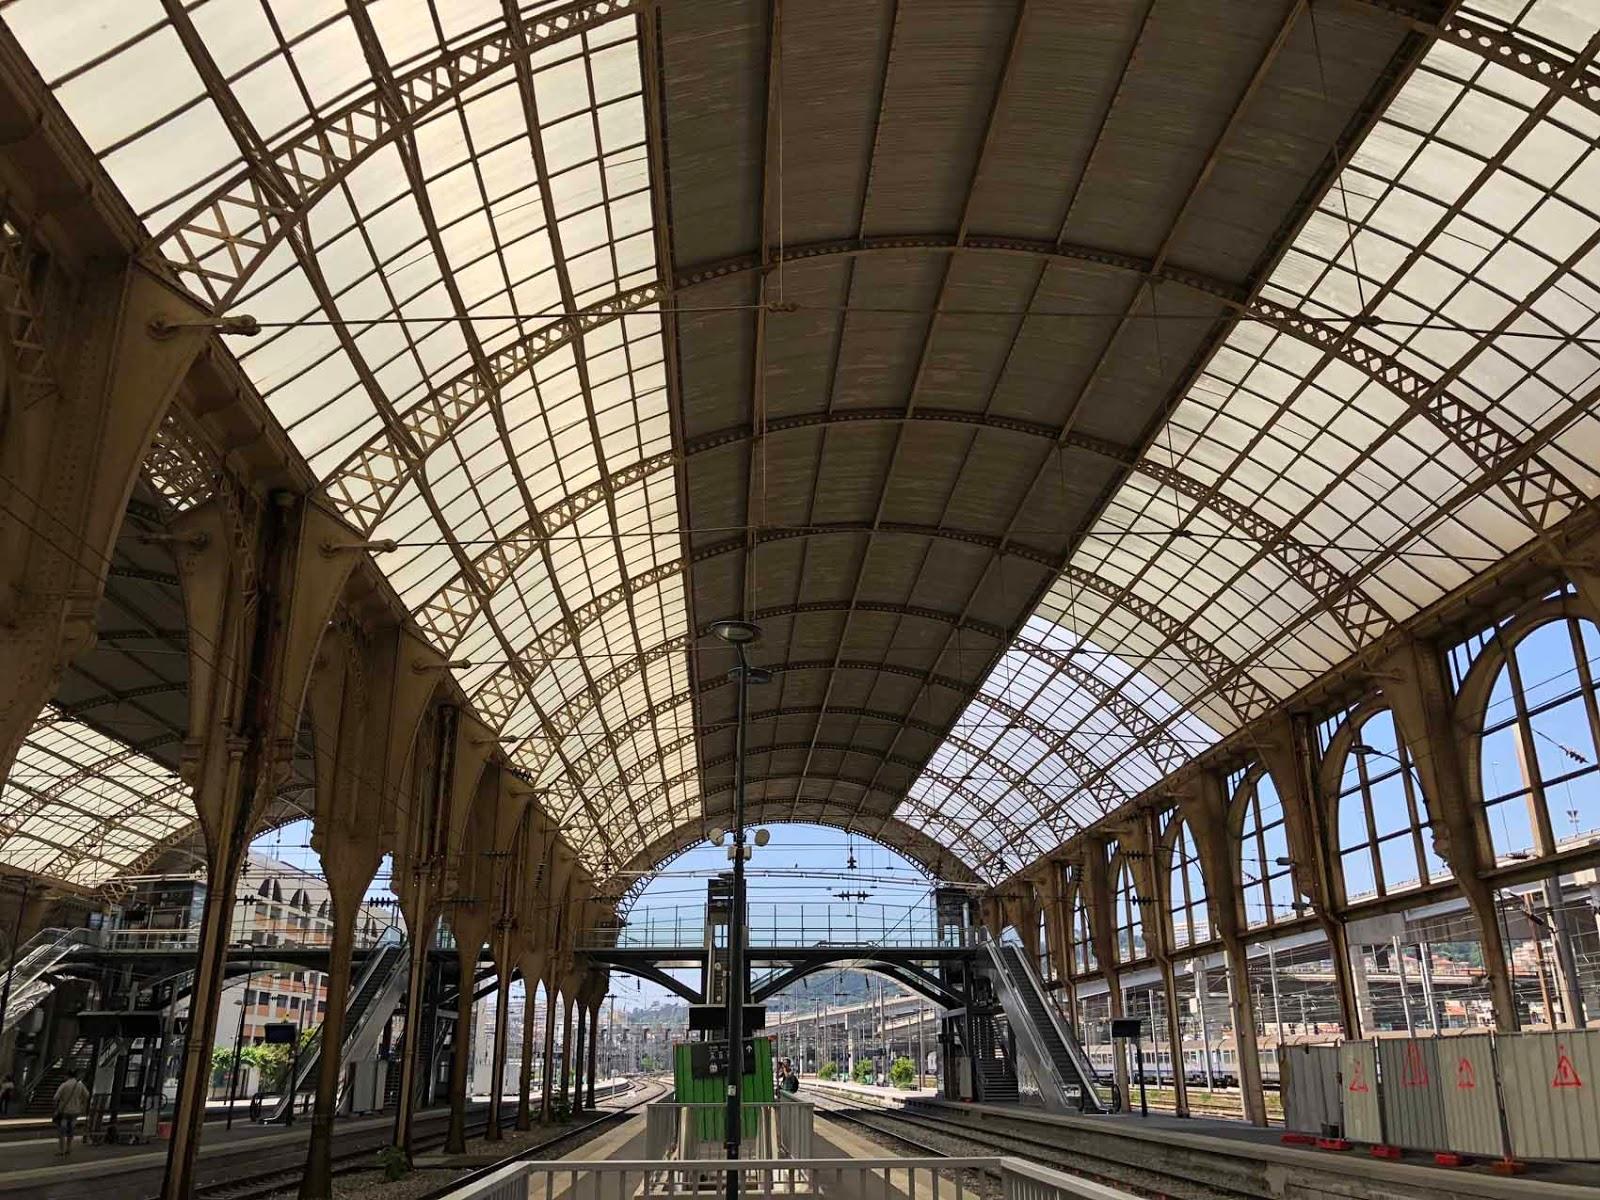 Nizzan upea rautatieasema